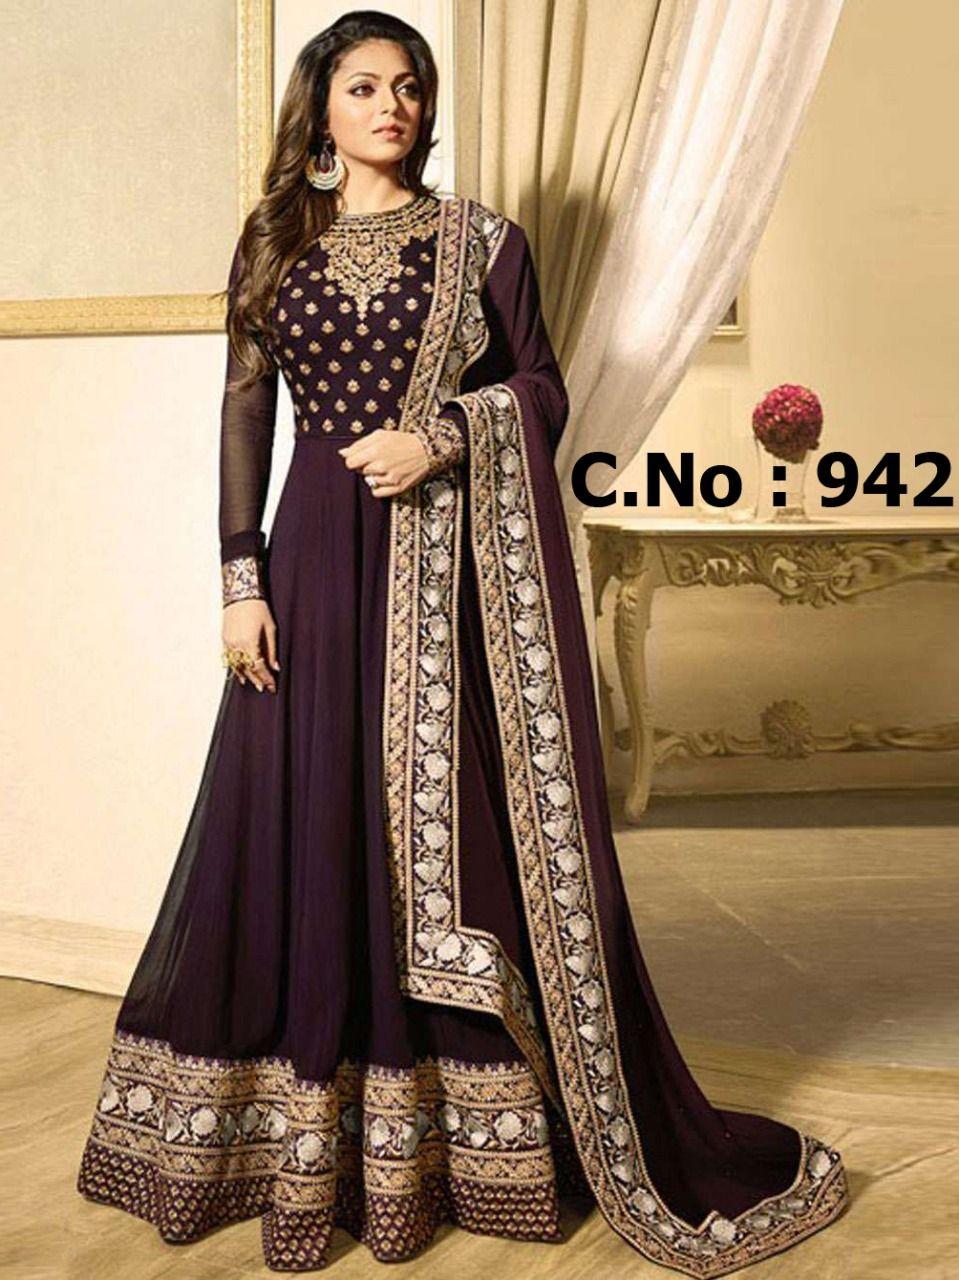 Indian Anarakli Salwar Kameez Pakistani Wedding Shalwar Suit Eid Bollywood Dress Ebay Shopping Sawarkameez Bollywood Dress Pakistani Dresses Indian Dresses